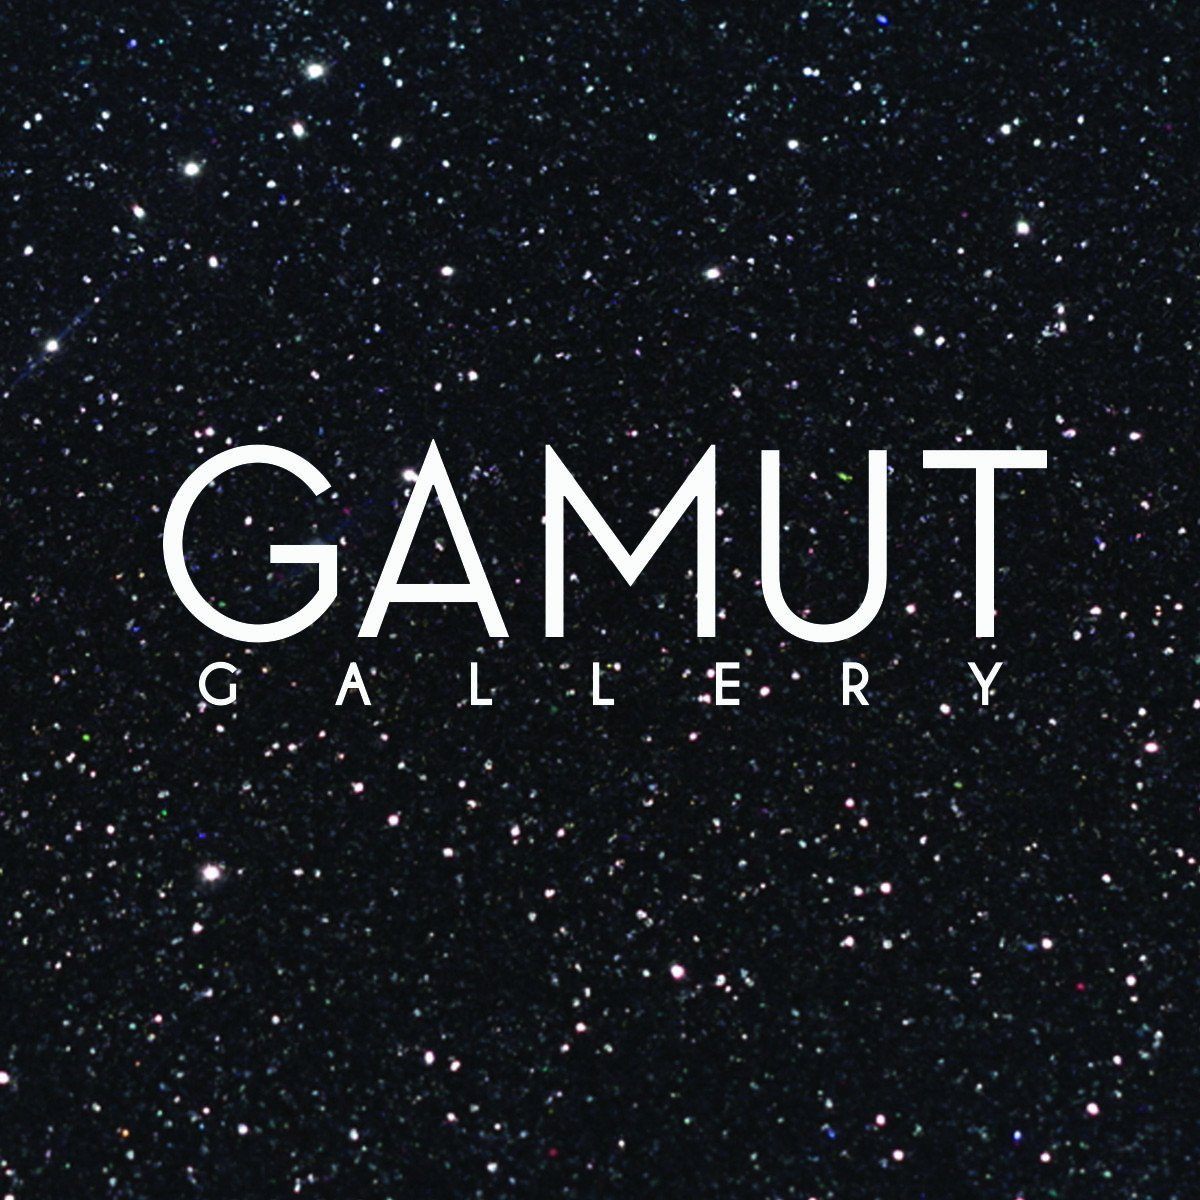 Gamut_Gallery_1024x1024@2x.jpg